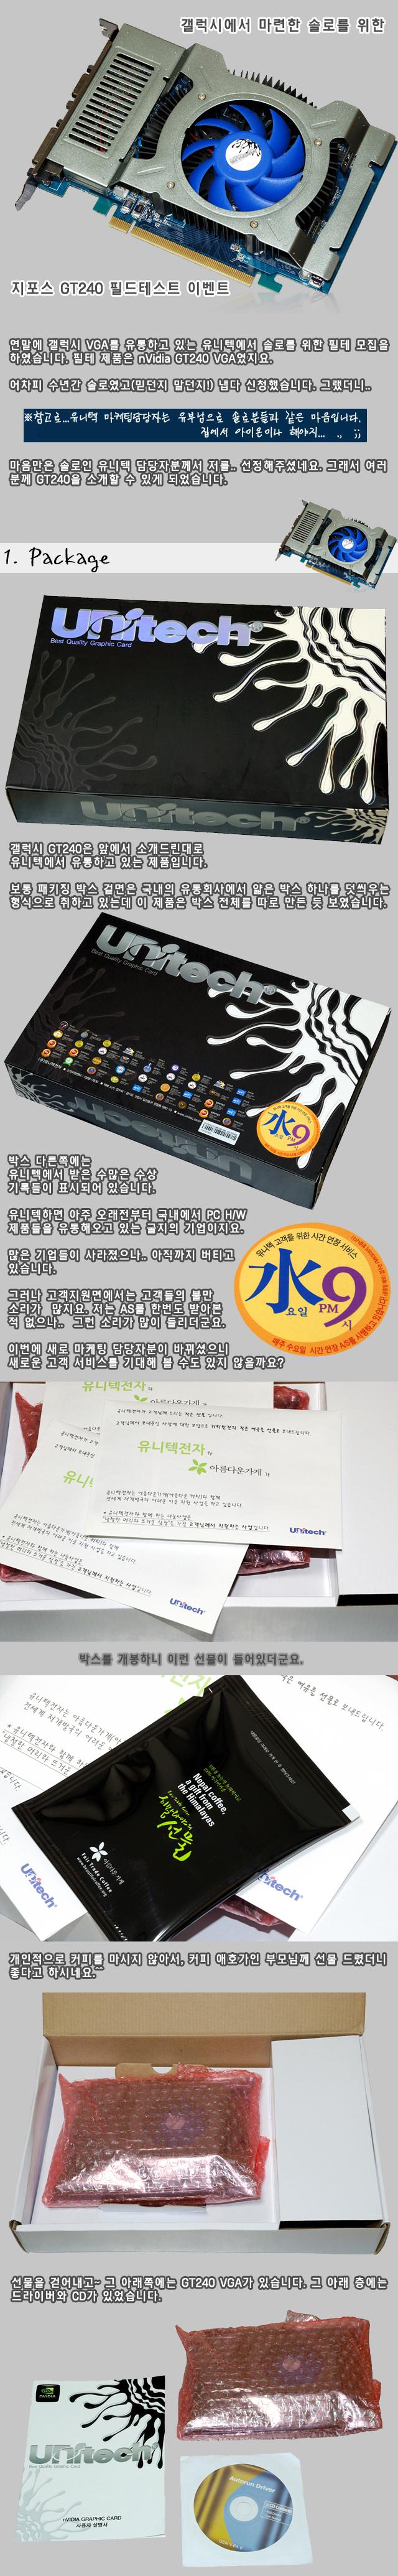 240, ATI, GT240, It, IT리뷰, nvidia, unitech, VGA, vga리뷰, 그래픽카드, 그래픽카드 추천, 리뷰, 엔비디아, 유니텍, 지포스, 타운뉴스, 타운리뷰, 타운포토, GeForce, GT220, vga추천, 메인스트림인가? 게인워드 GT220 1GB HDMI VGA, 보급형인가, 뷰플, 그래픽카드 드라이버 다운, 지포스 9800gt, 그래픽카드 보는법, 그래픽카드 성능순위, 그래픽카드 순위, 가성비 좋은 그래픽카드, 그래픽카드 교체방법, 다나와, cpu, 그래픽카드 드라이버, 지포스 그래픽카드, 그래픽카드 업그레이드, 블소 그래픽카드, 그래픽, 램, 그래픽카드 확인방법, 메인보드, 그래픽카드 다운, pc하드웨어, pc리뷰, 사진, 이슈, OCER, ocer리뷰, PC, 타운염장, pc부품, 하드웨어 리뷰, IT뉴스